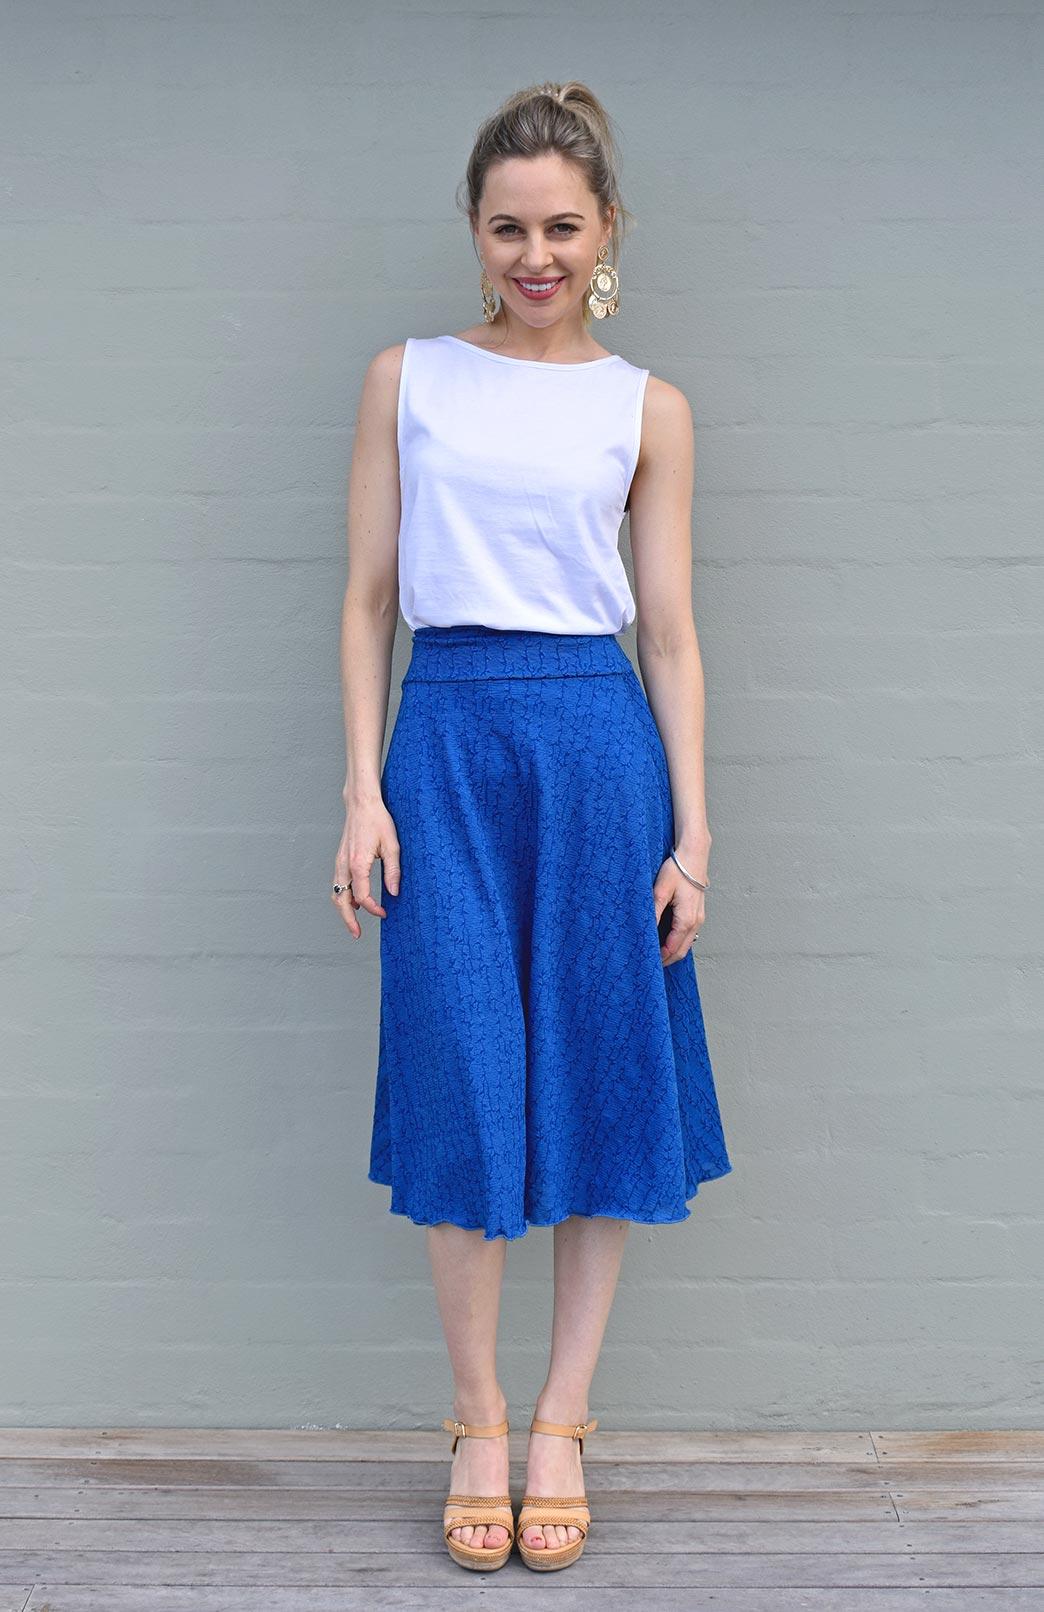 Twirl Skirt - Women's Azure Blue Patterned A-Line Swing Wool Skirt - Smitten Merino Tasmania Australia